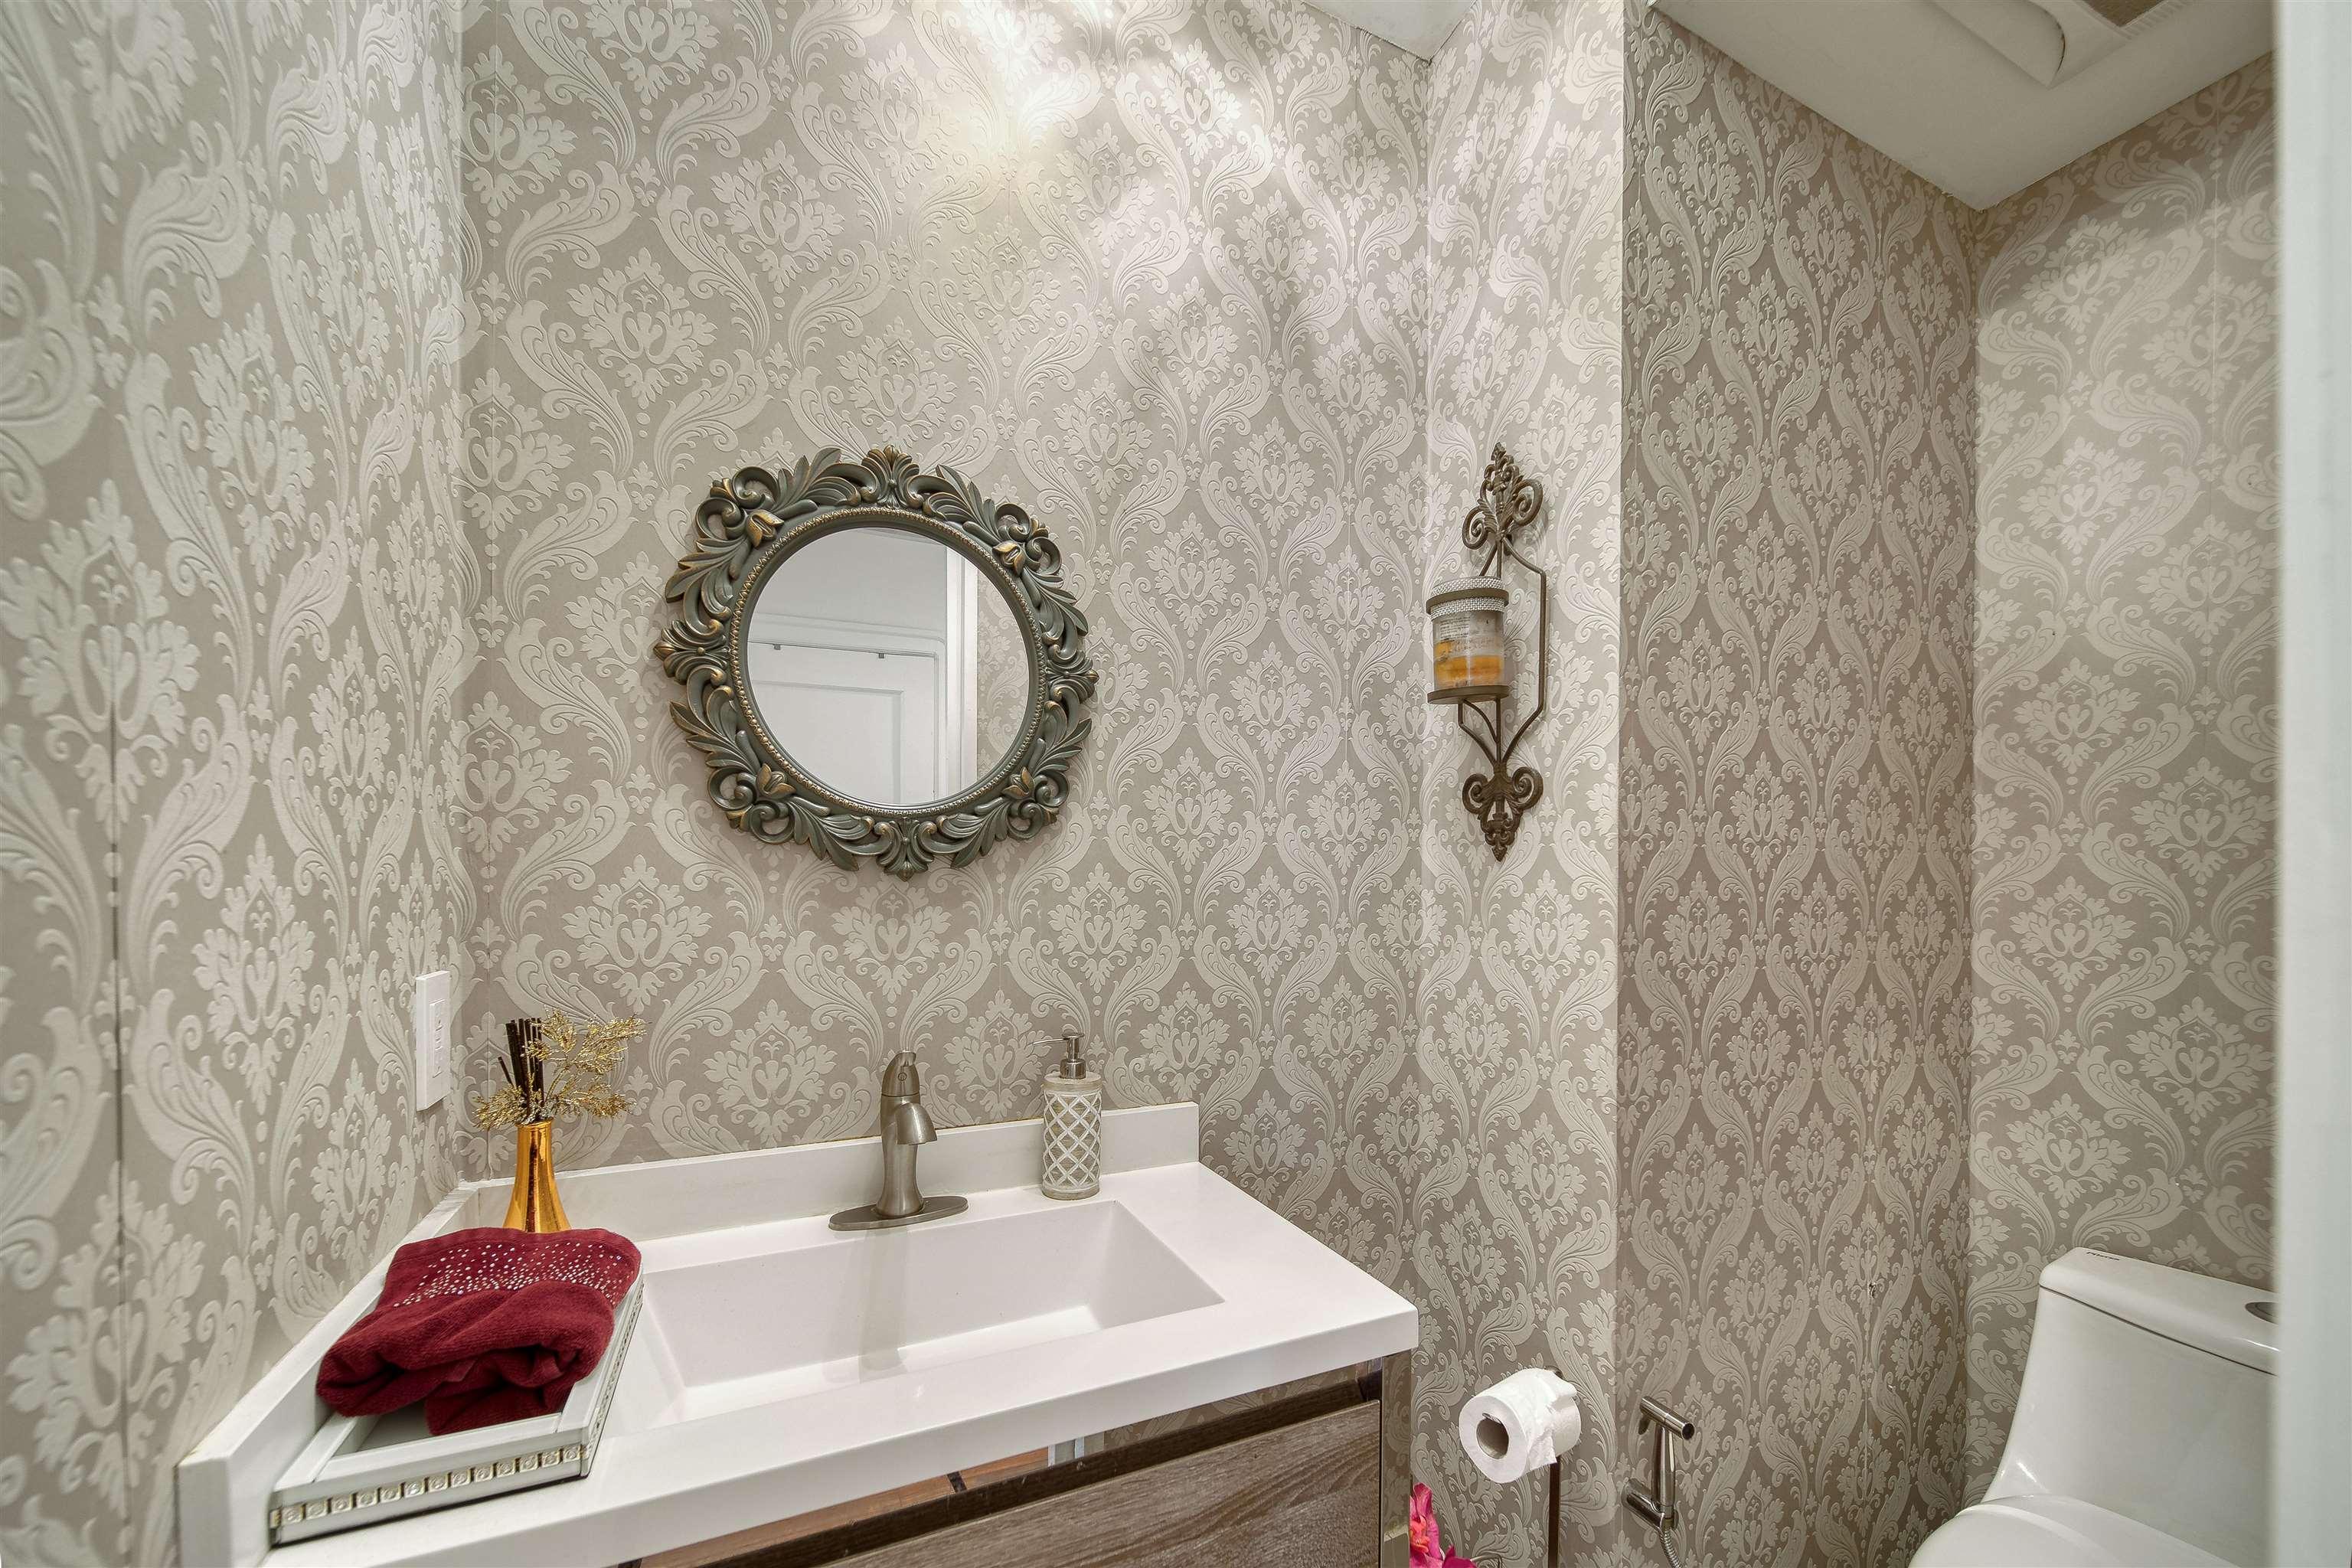 1357 FULTON AVENUE - Ambleside House/Single Family for sale, 6 Bedrooms (R2617731) - #22